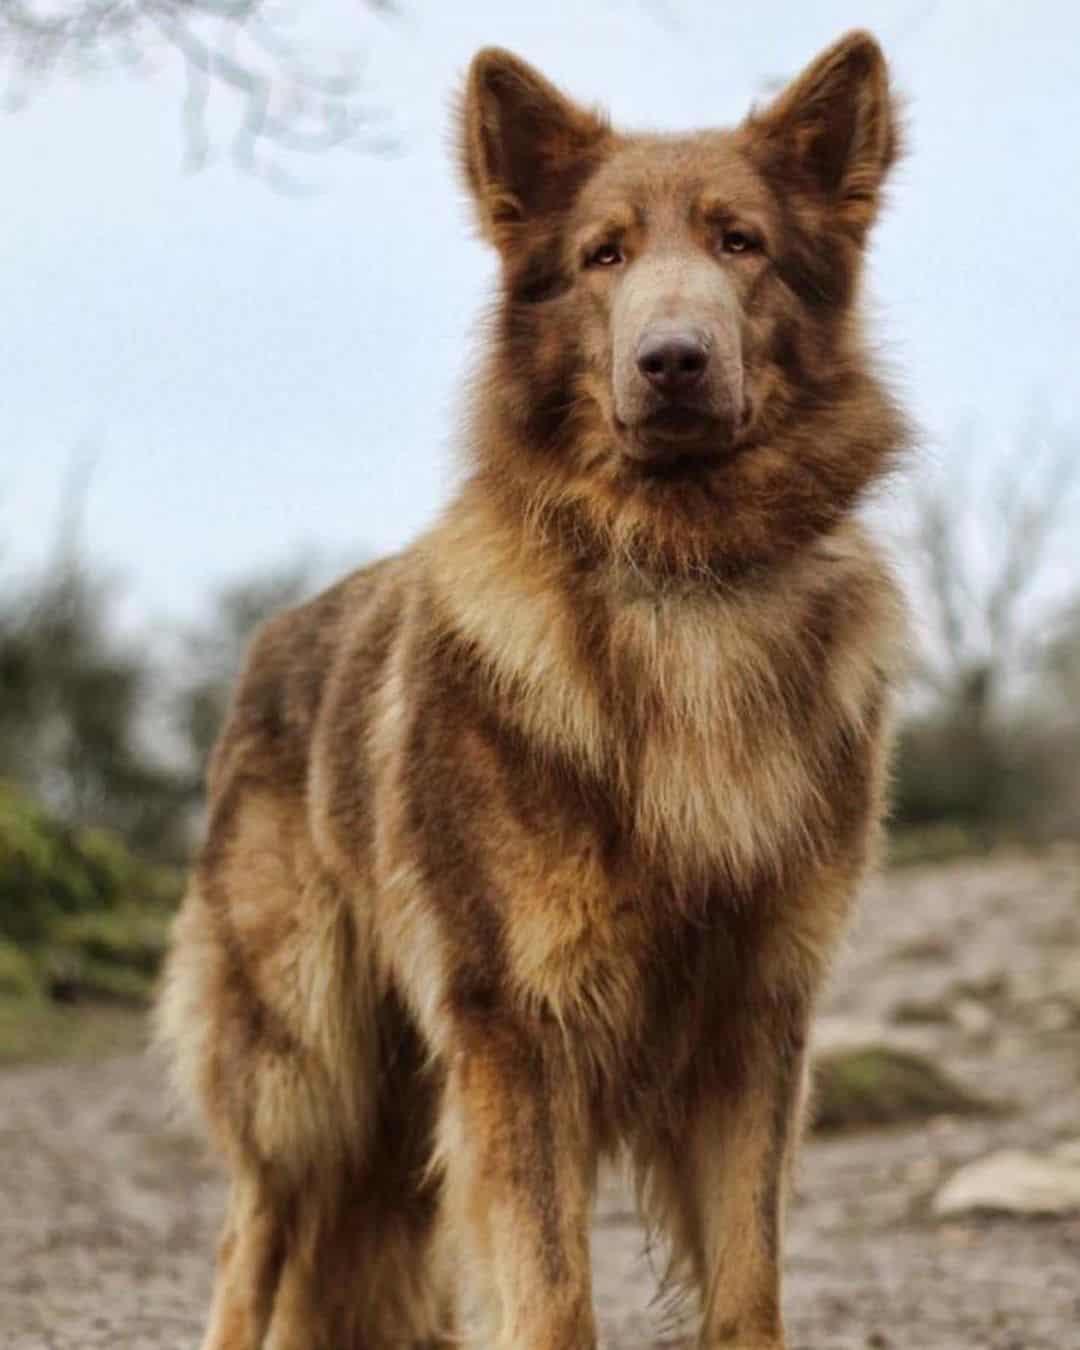 isabella german shepherd dog standing outdoors